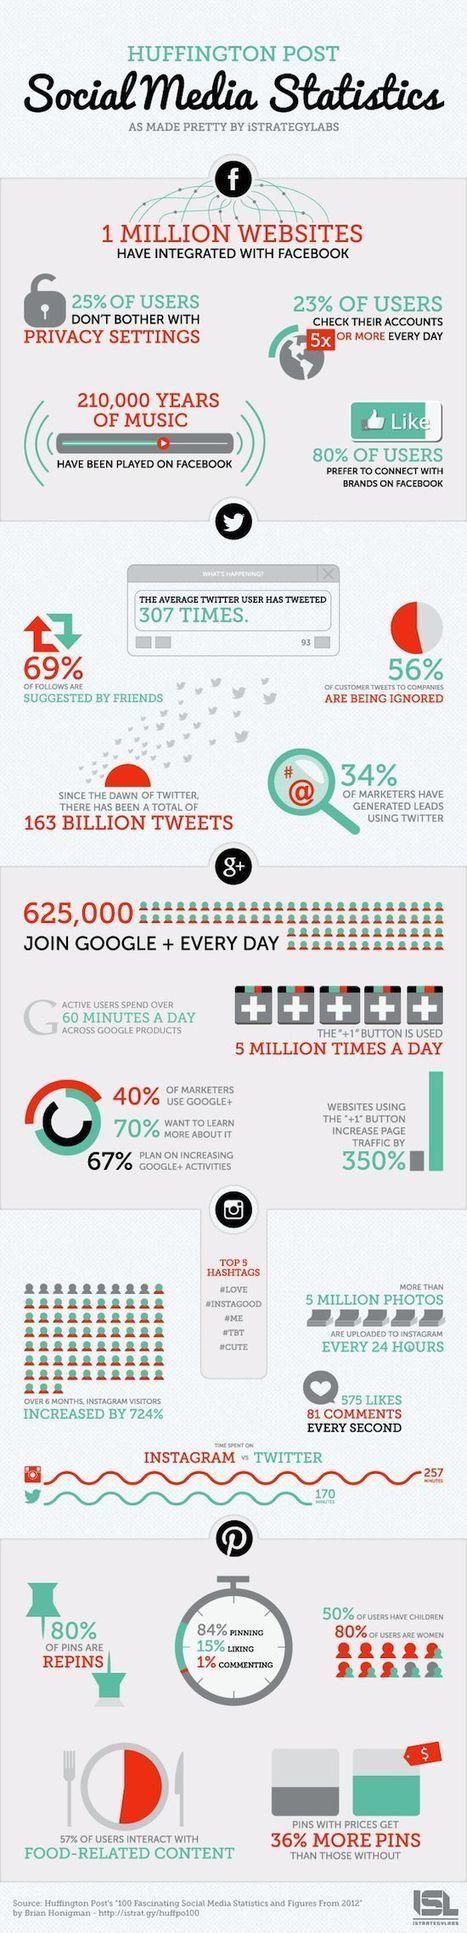 Facebook Twitter Pinterest Instagram Foursquare | Community Manager & Social Media en France | Scoop.it